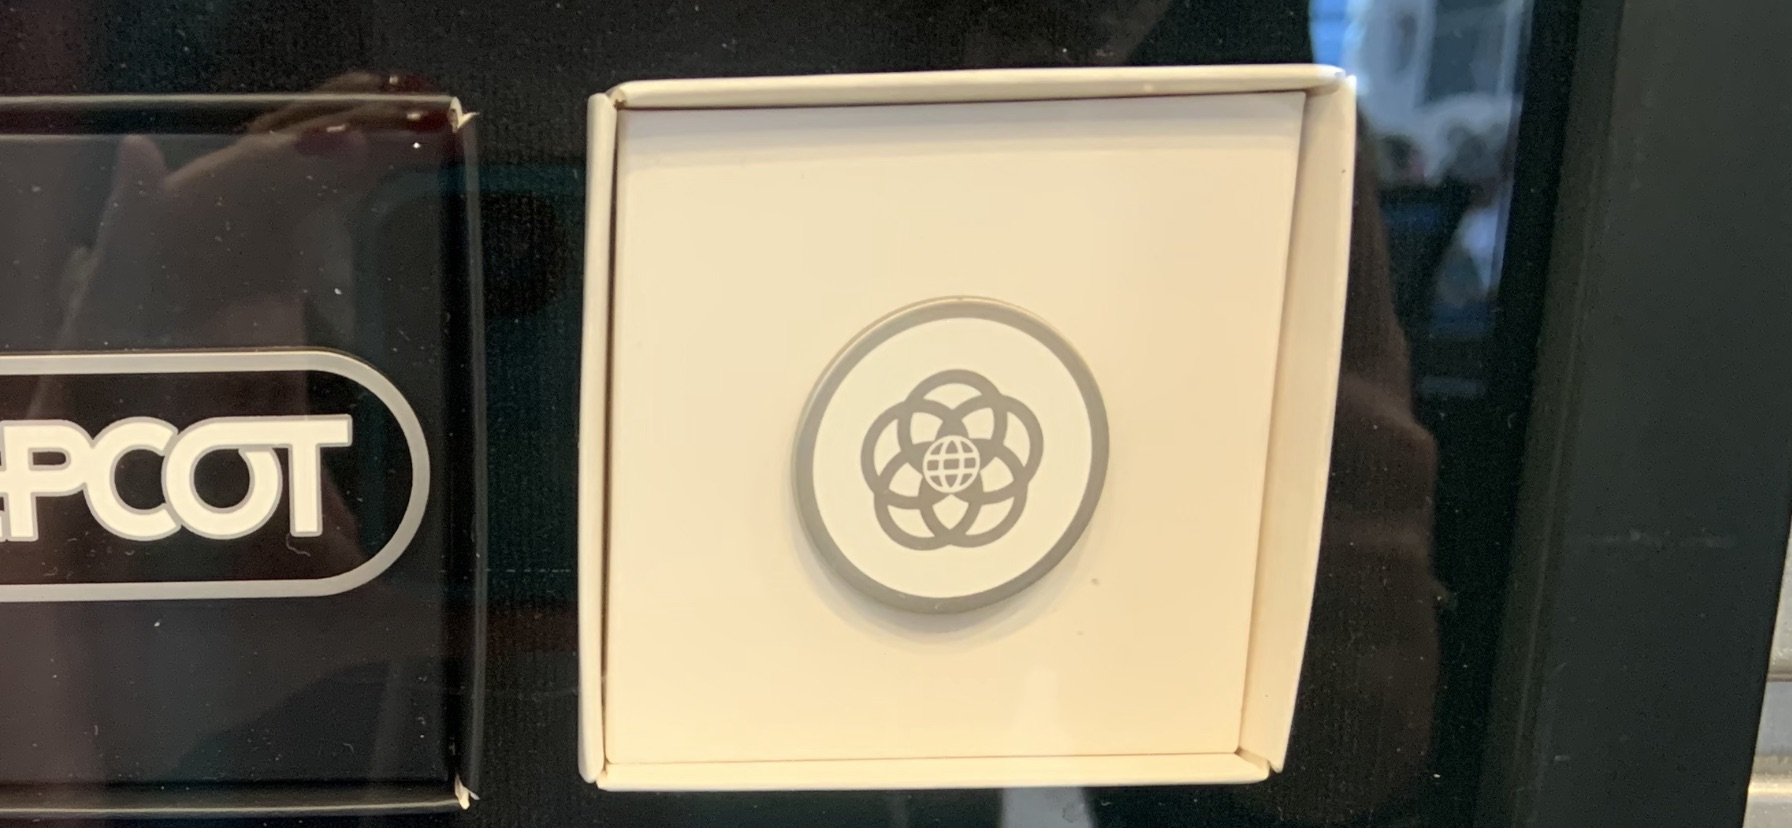 EPCOT pavilion logo pins 12/23/19 13